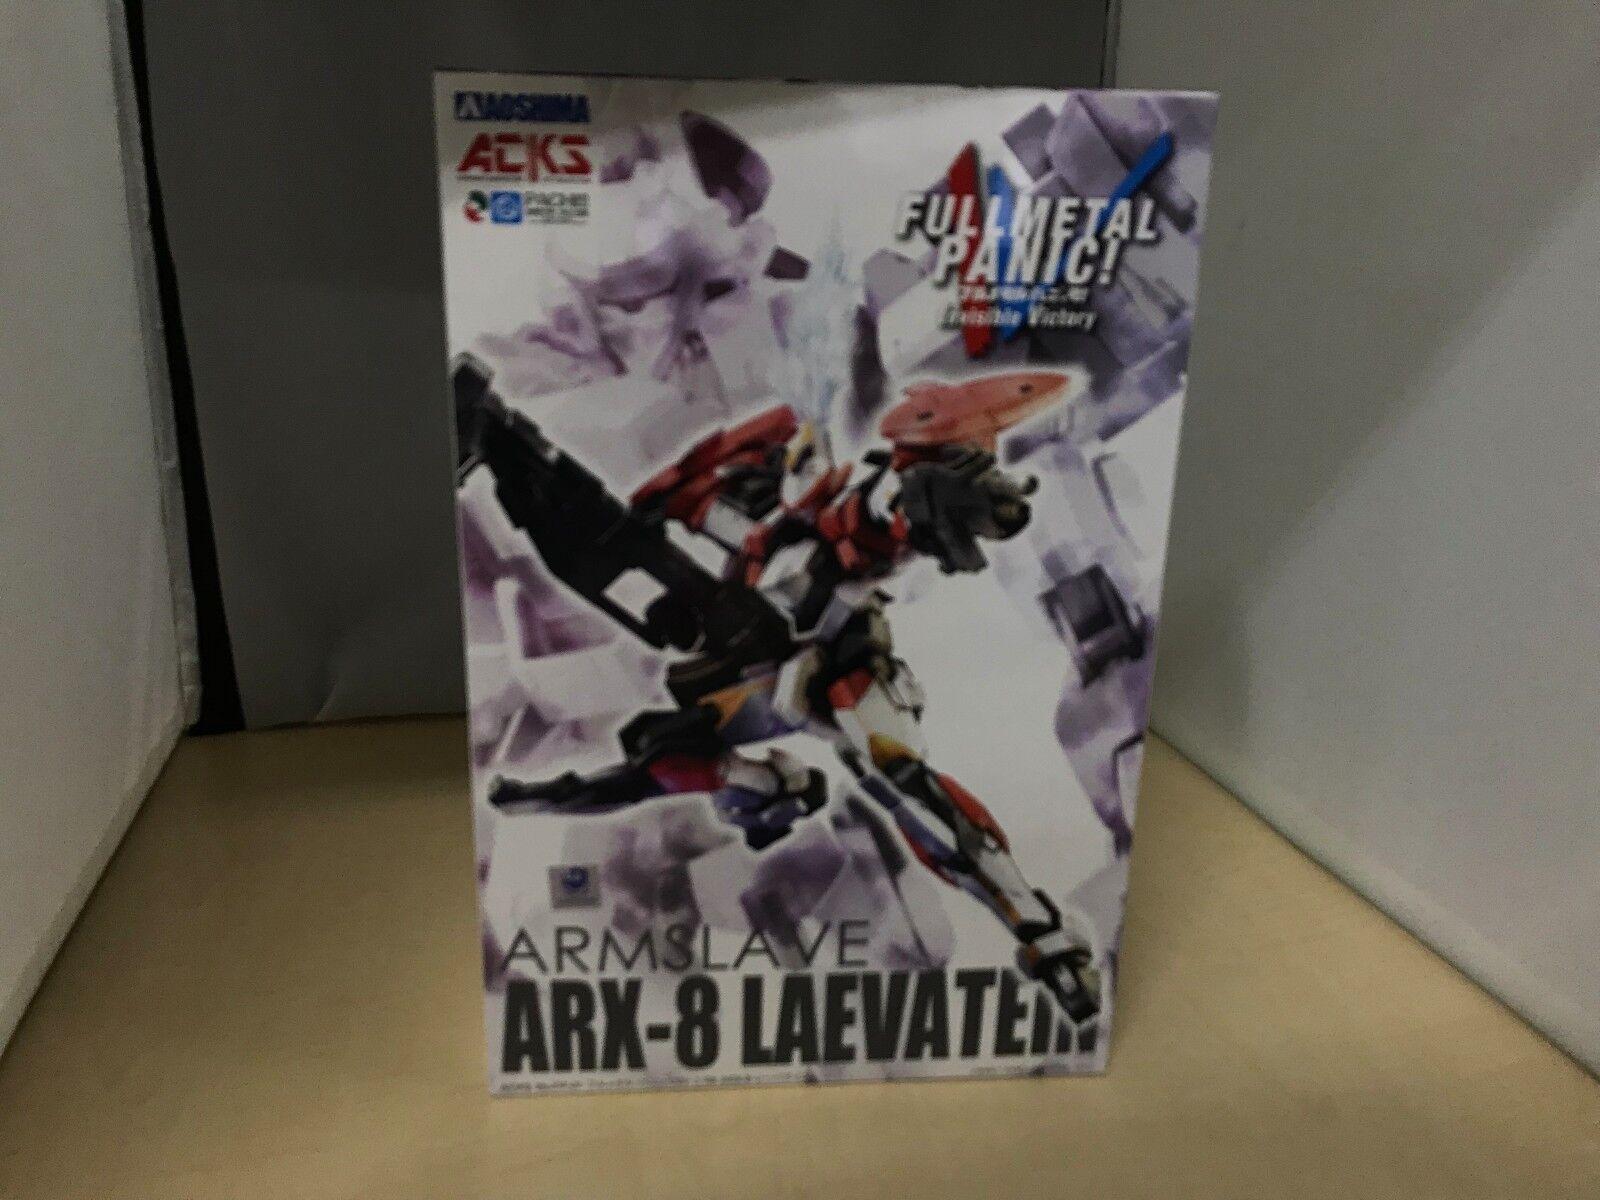 Aoshima Bunka Kyozai Full Metal Panic IV ARX-8 Laevatein 1/48 Scale